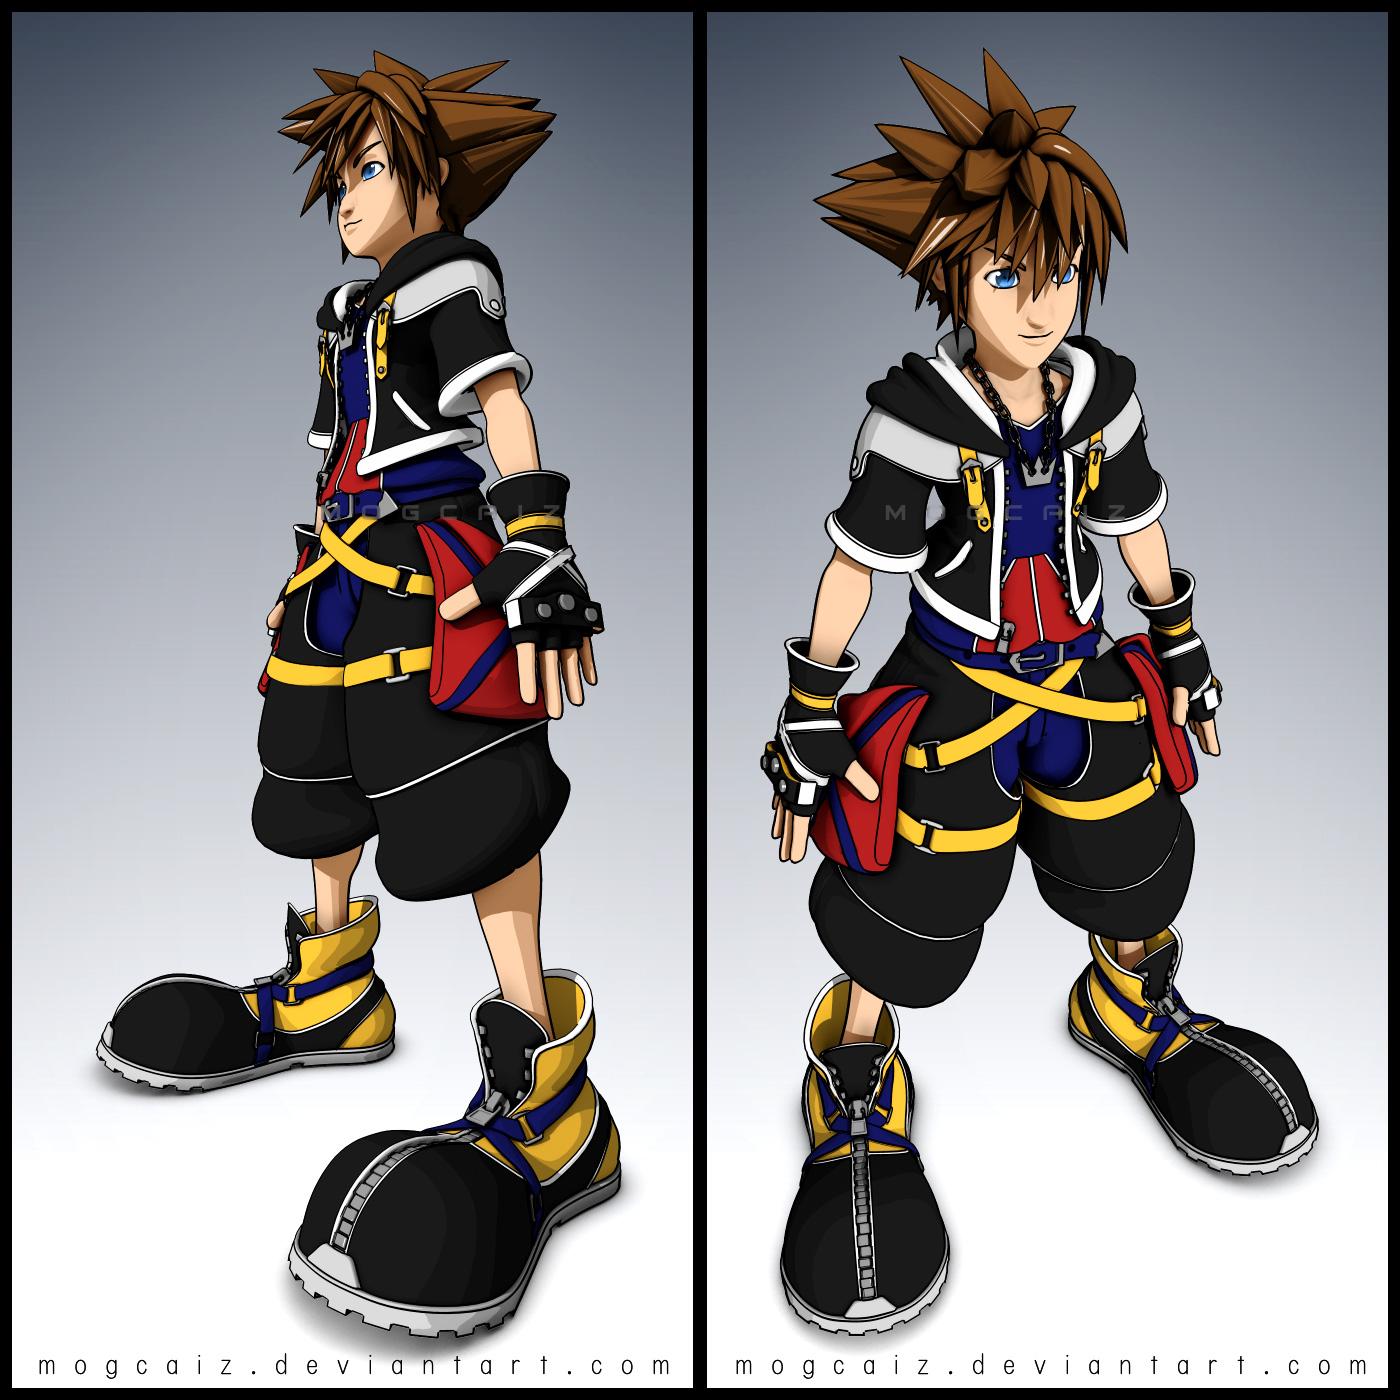 Sora - Toon Shader